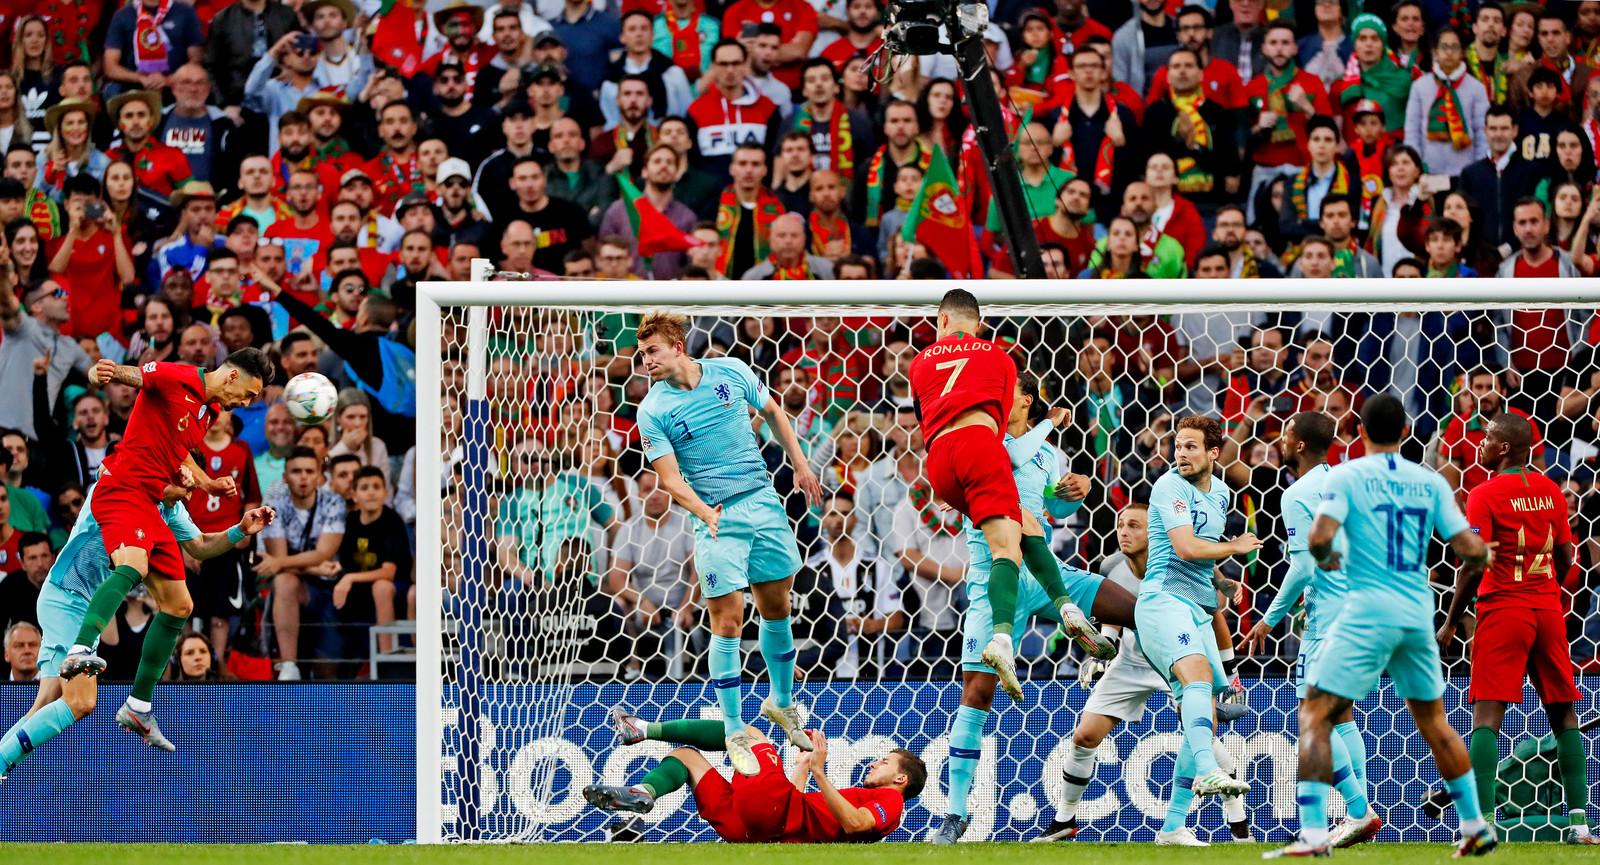 Nations League Fianl Four 2019 Jose fonte kopt. Matthijs de Ligt en Daley Blind staan paraat opa de doellijn om Ronaldo af te stoppen Foto ; Pim Ras